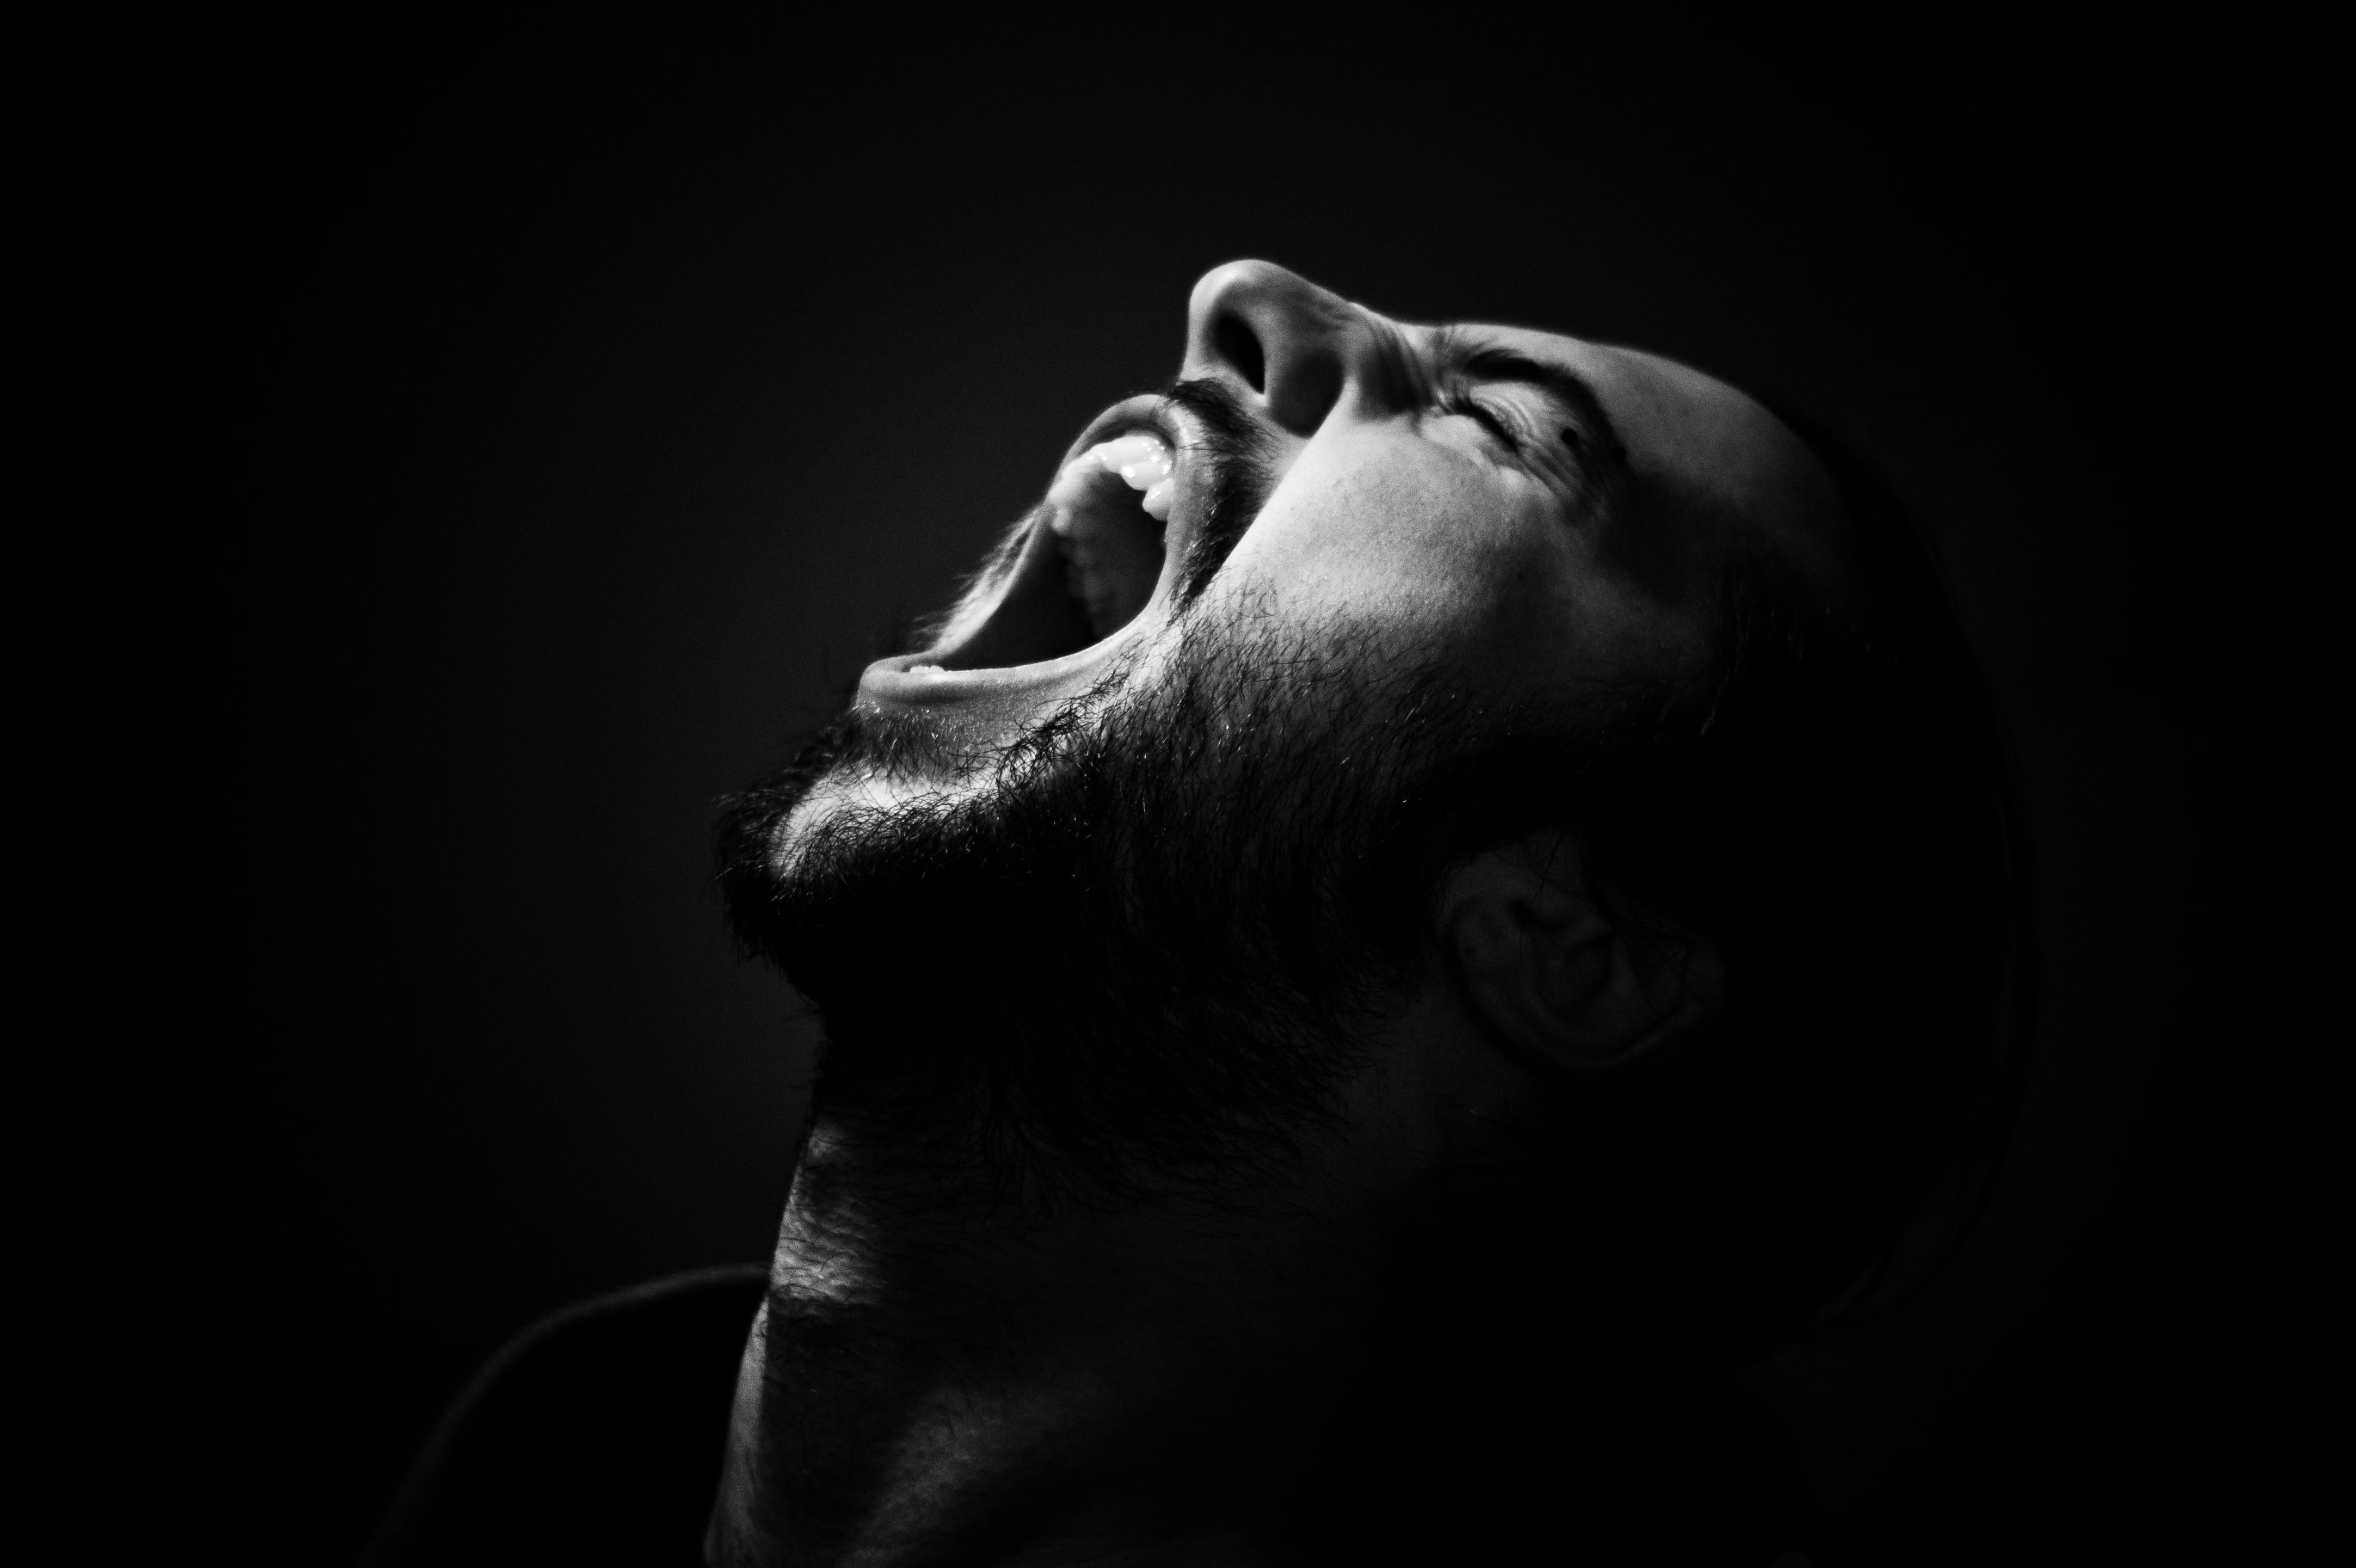 swearing pain